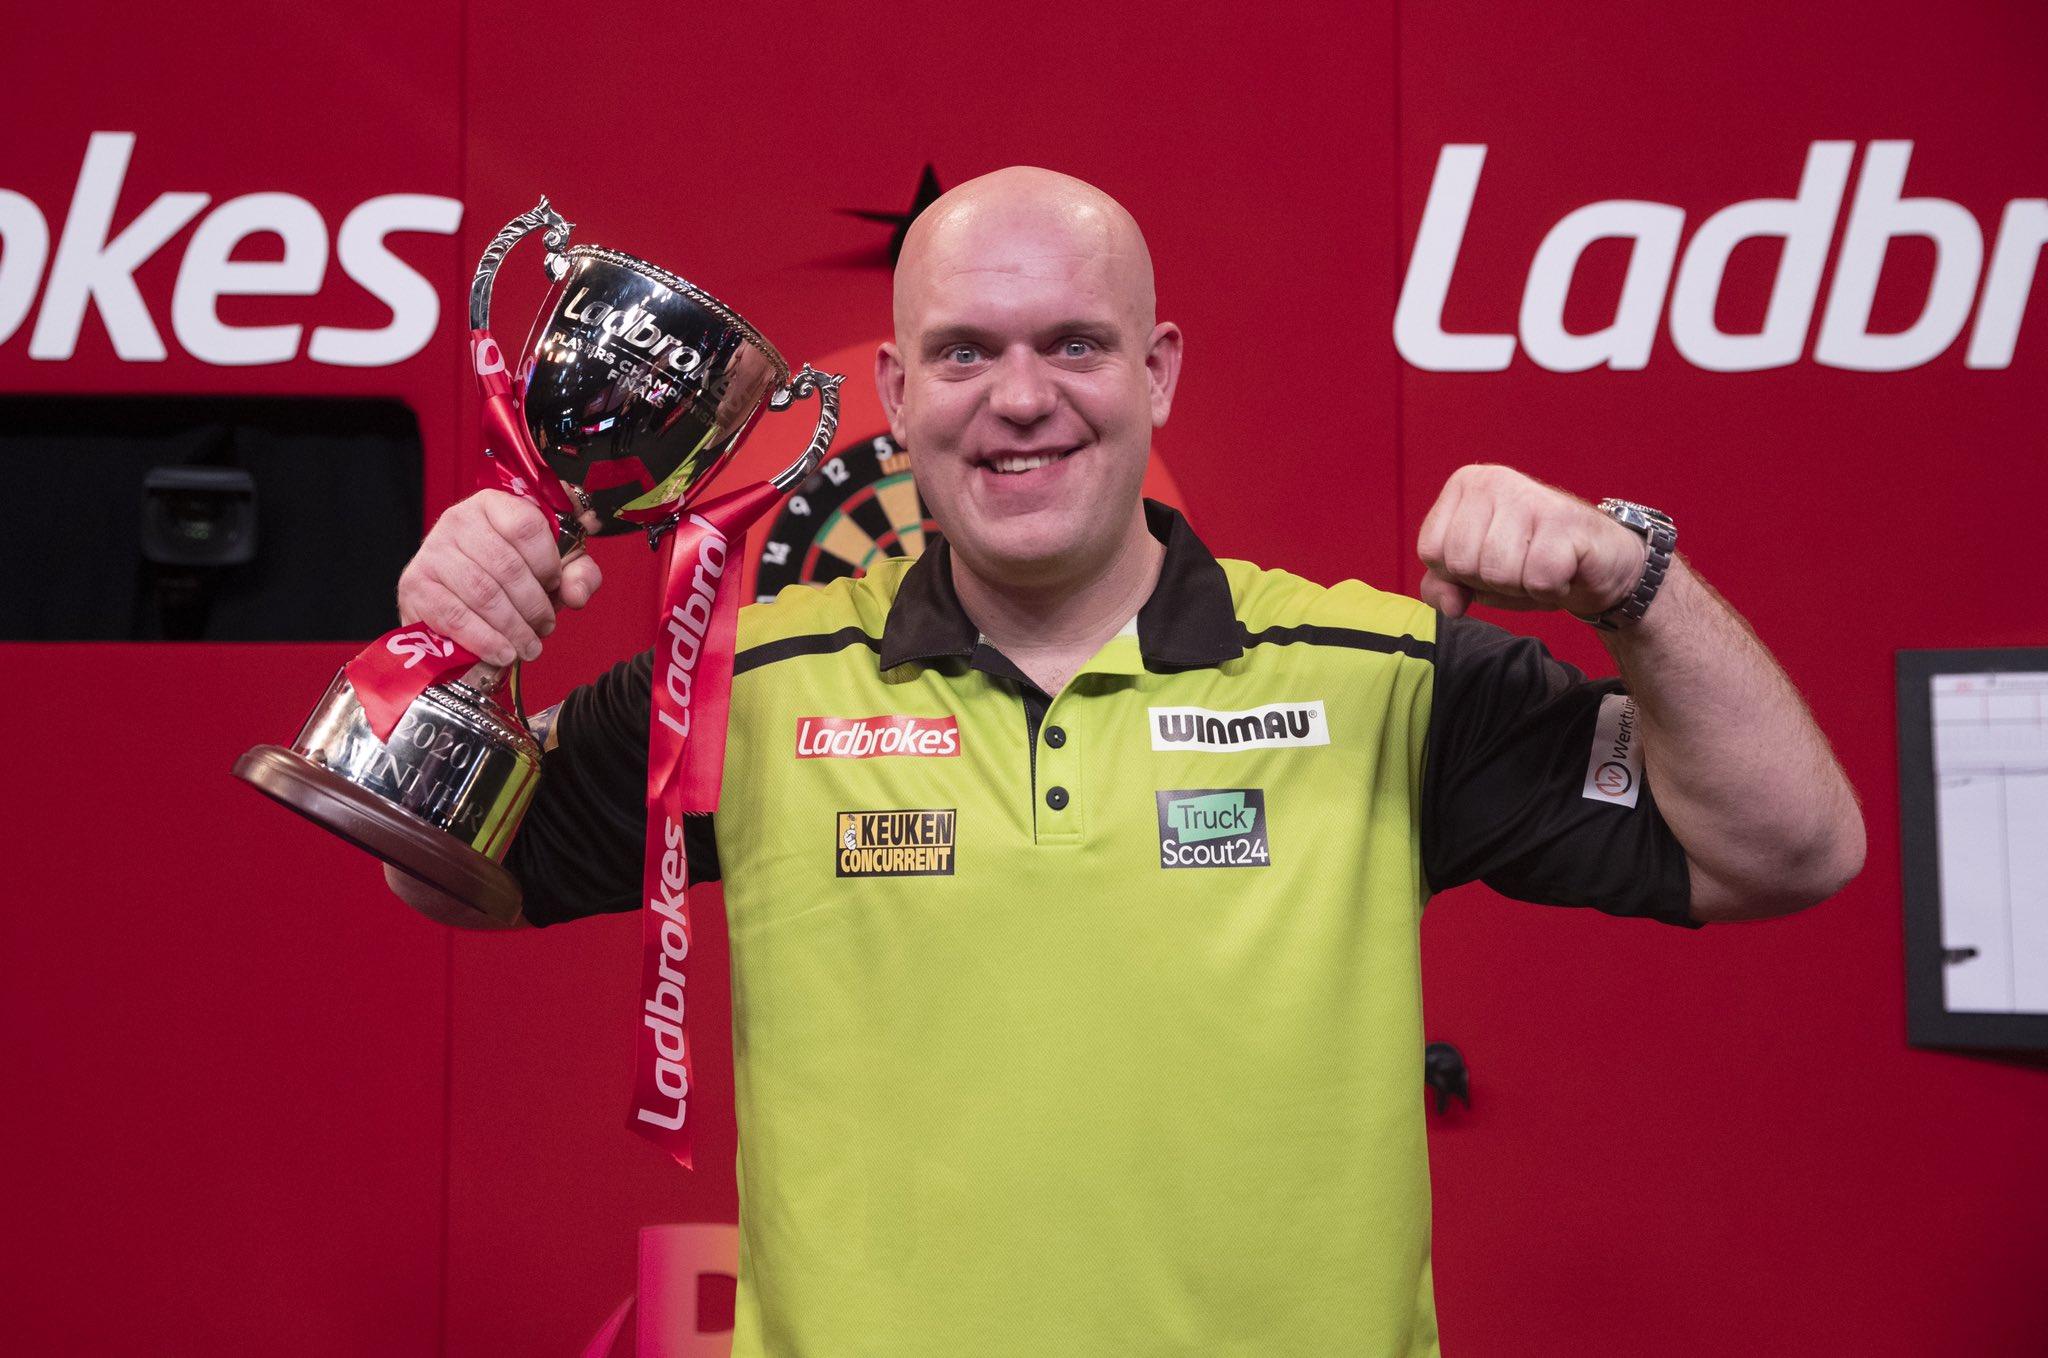 Van Gerwen wins 2020 Players Championship Finals